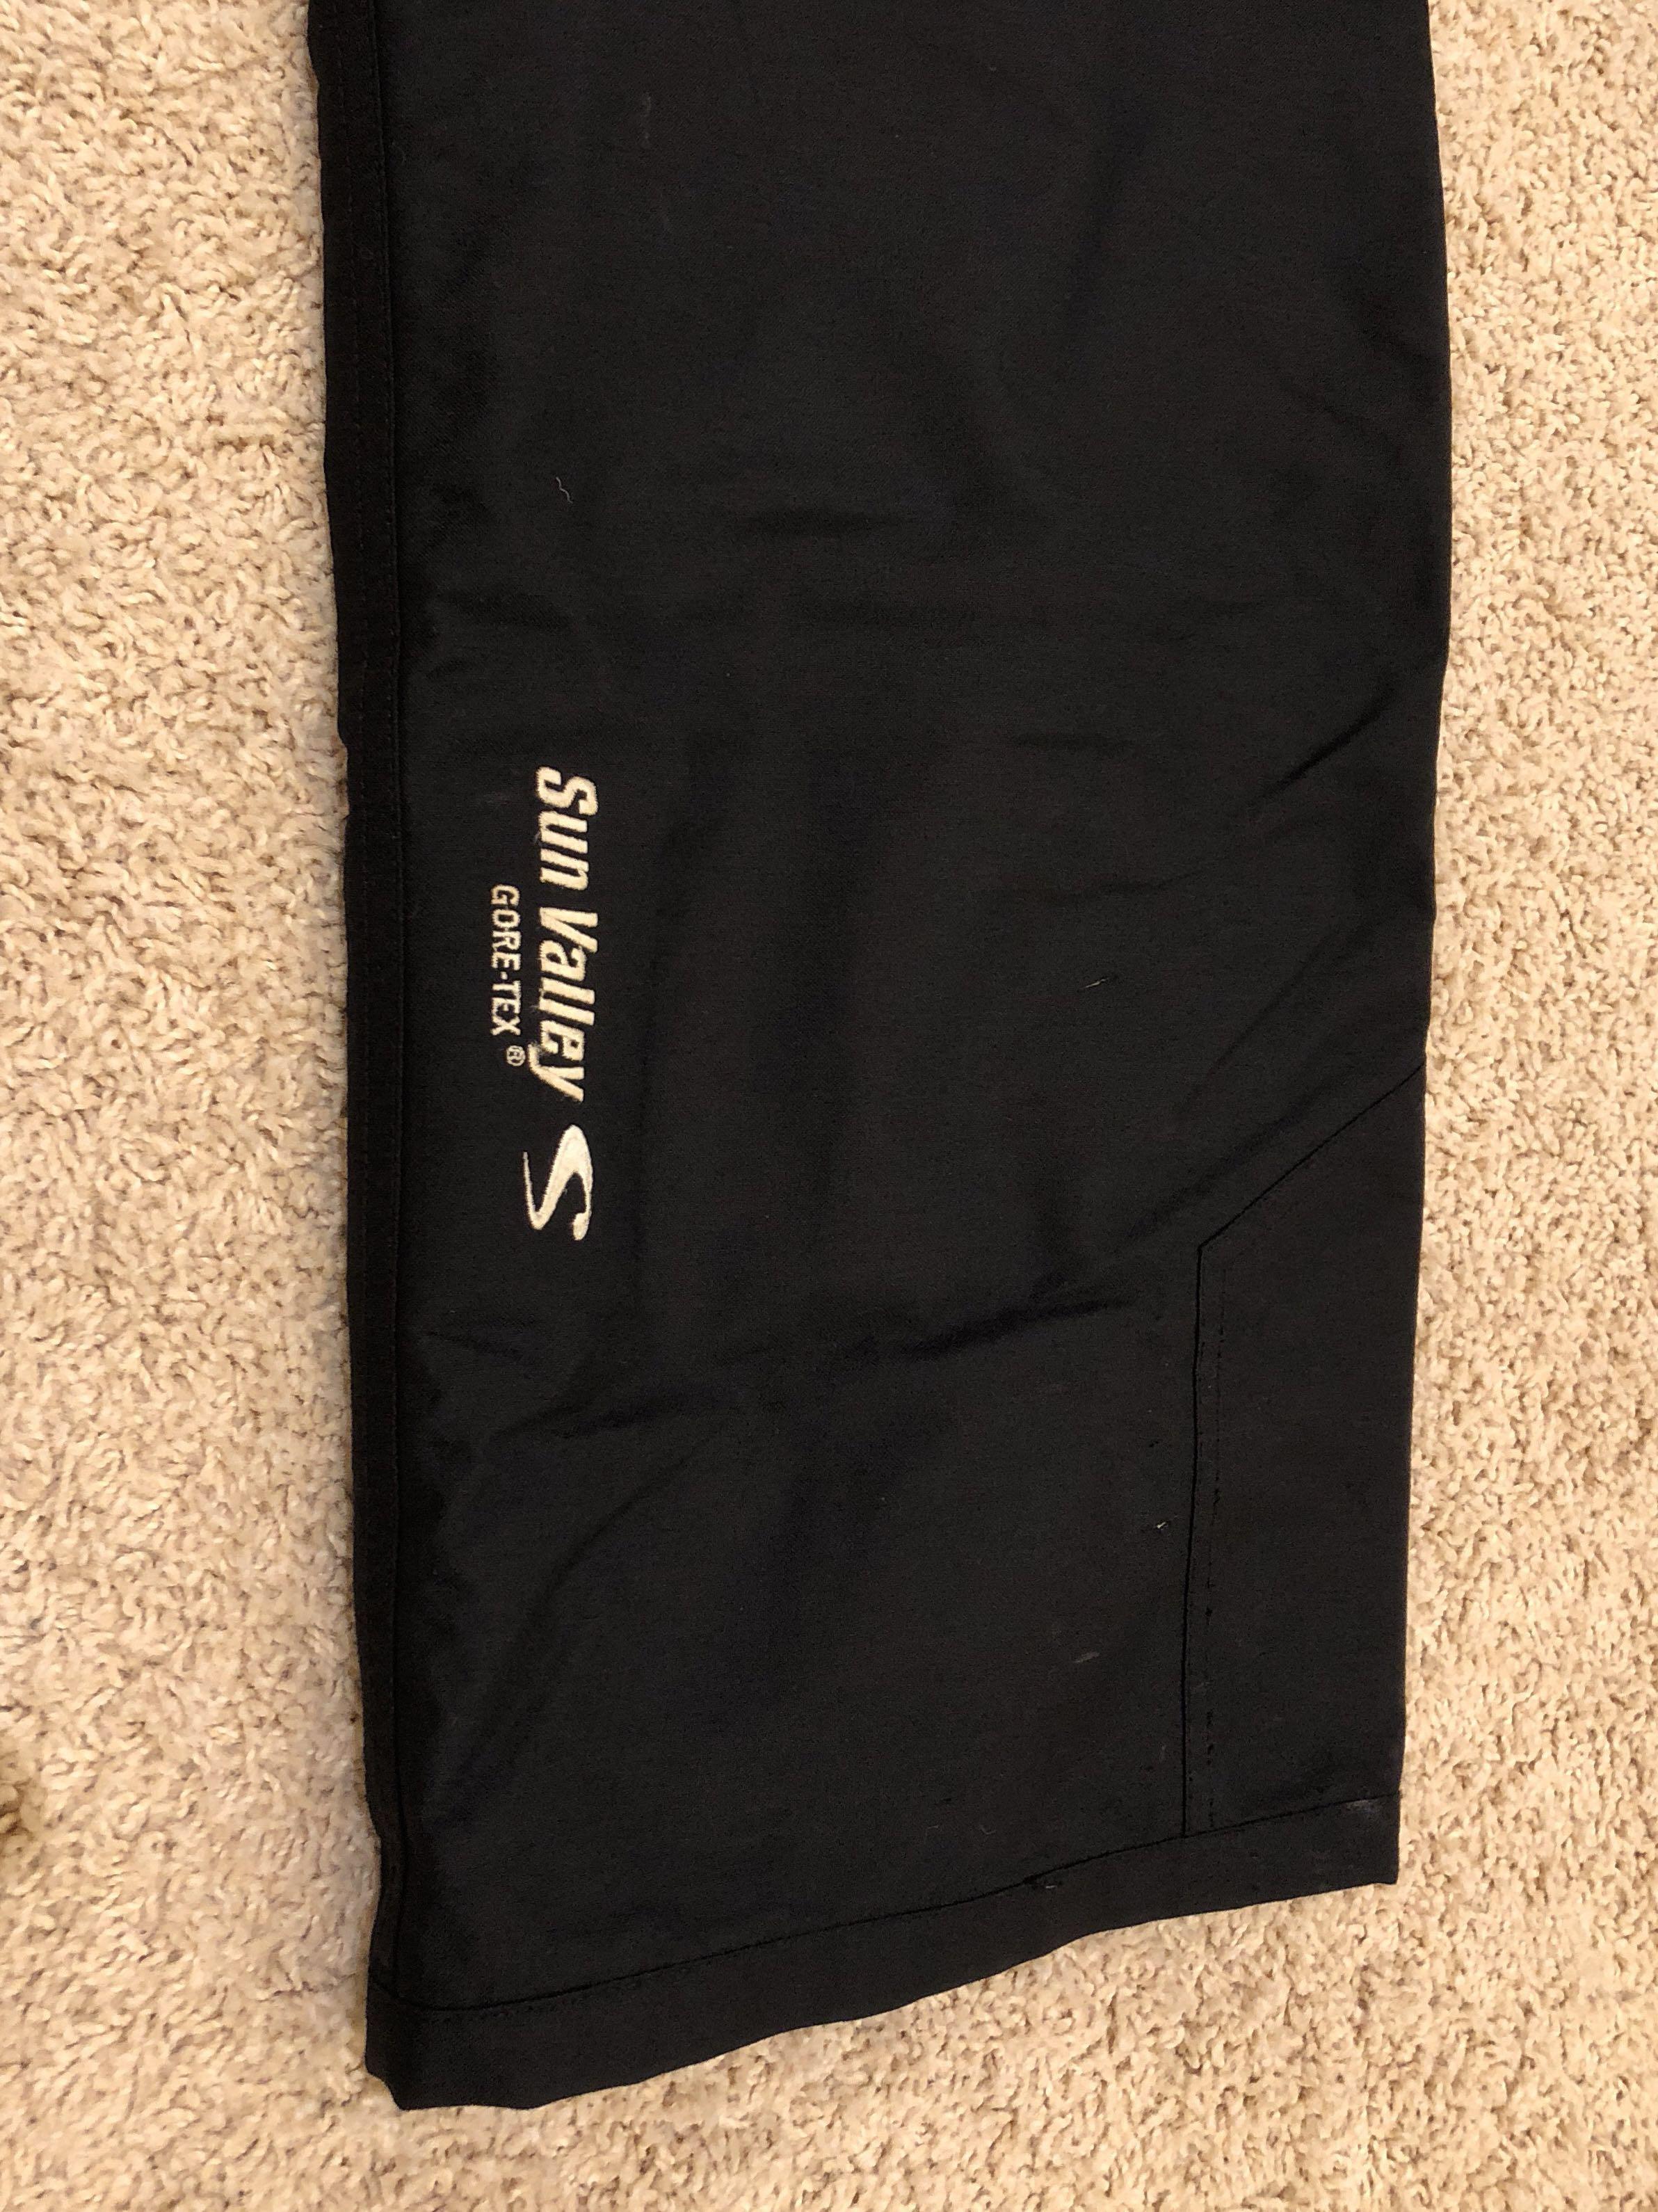 [rock bottom!] Men's ski/snowboard pants